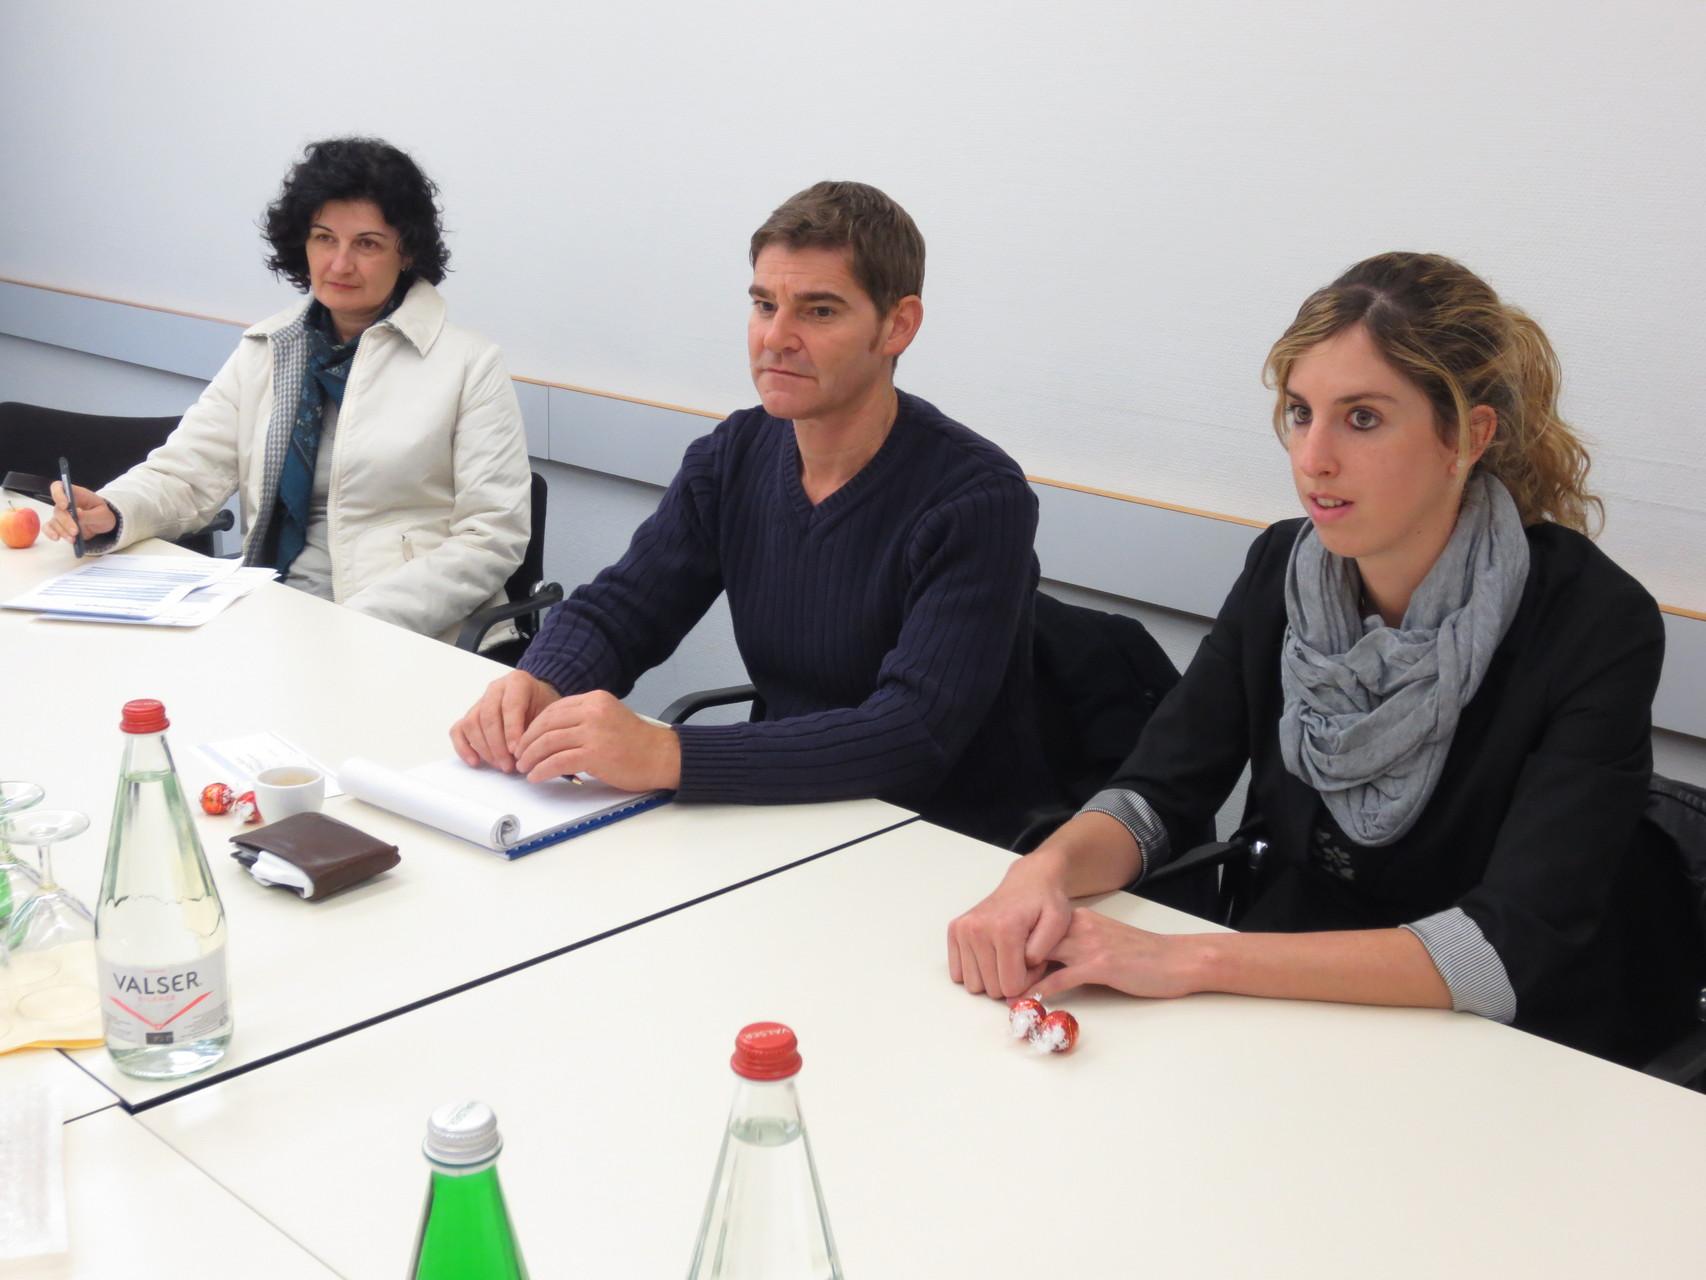 In Erwartung was da kommt...., v.l.n.r. Lorena Laffranchini Bonanomi, Corrado Oberto und Sandra Niederberger